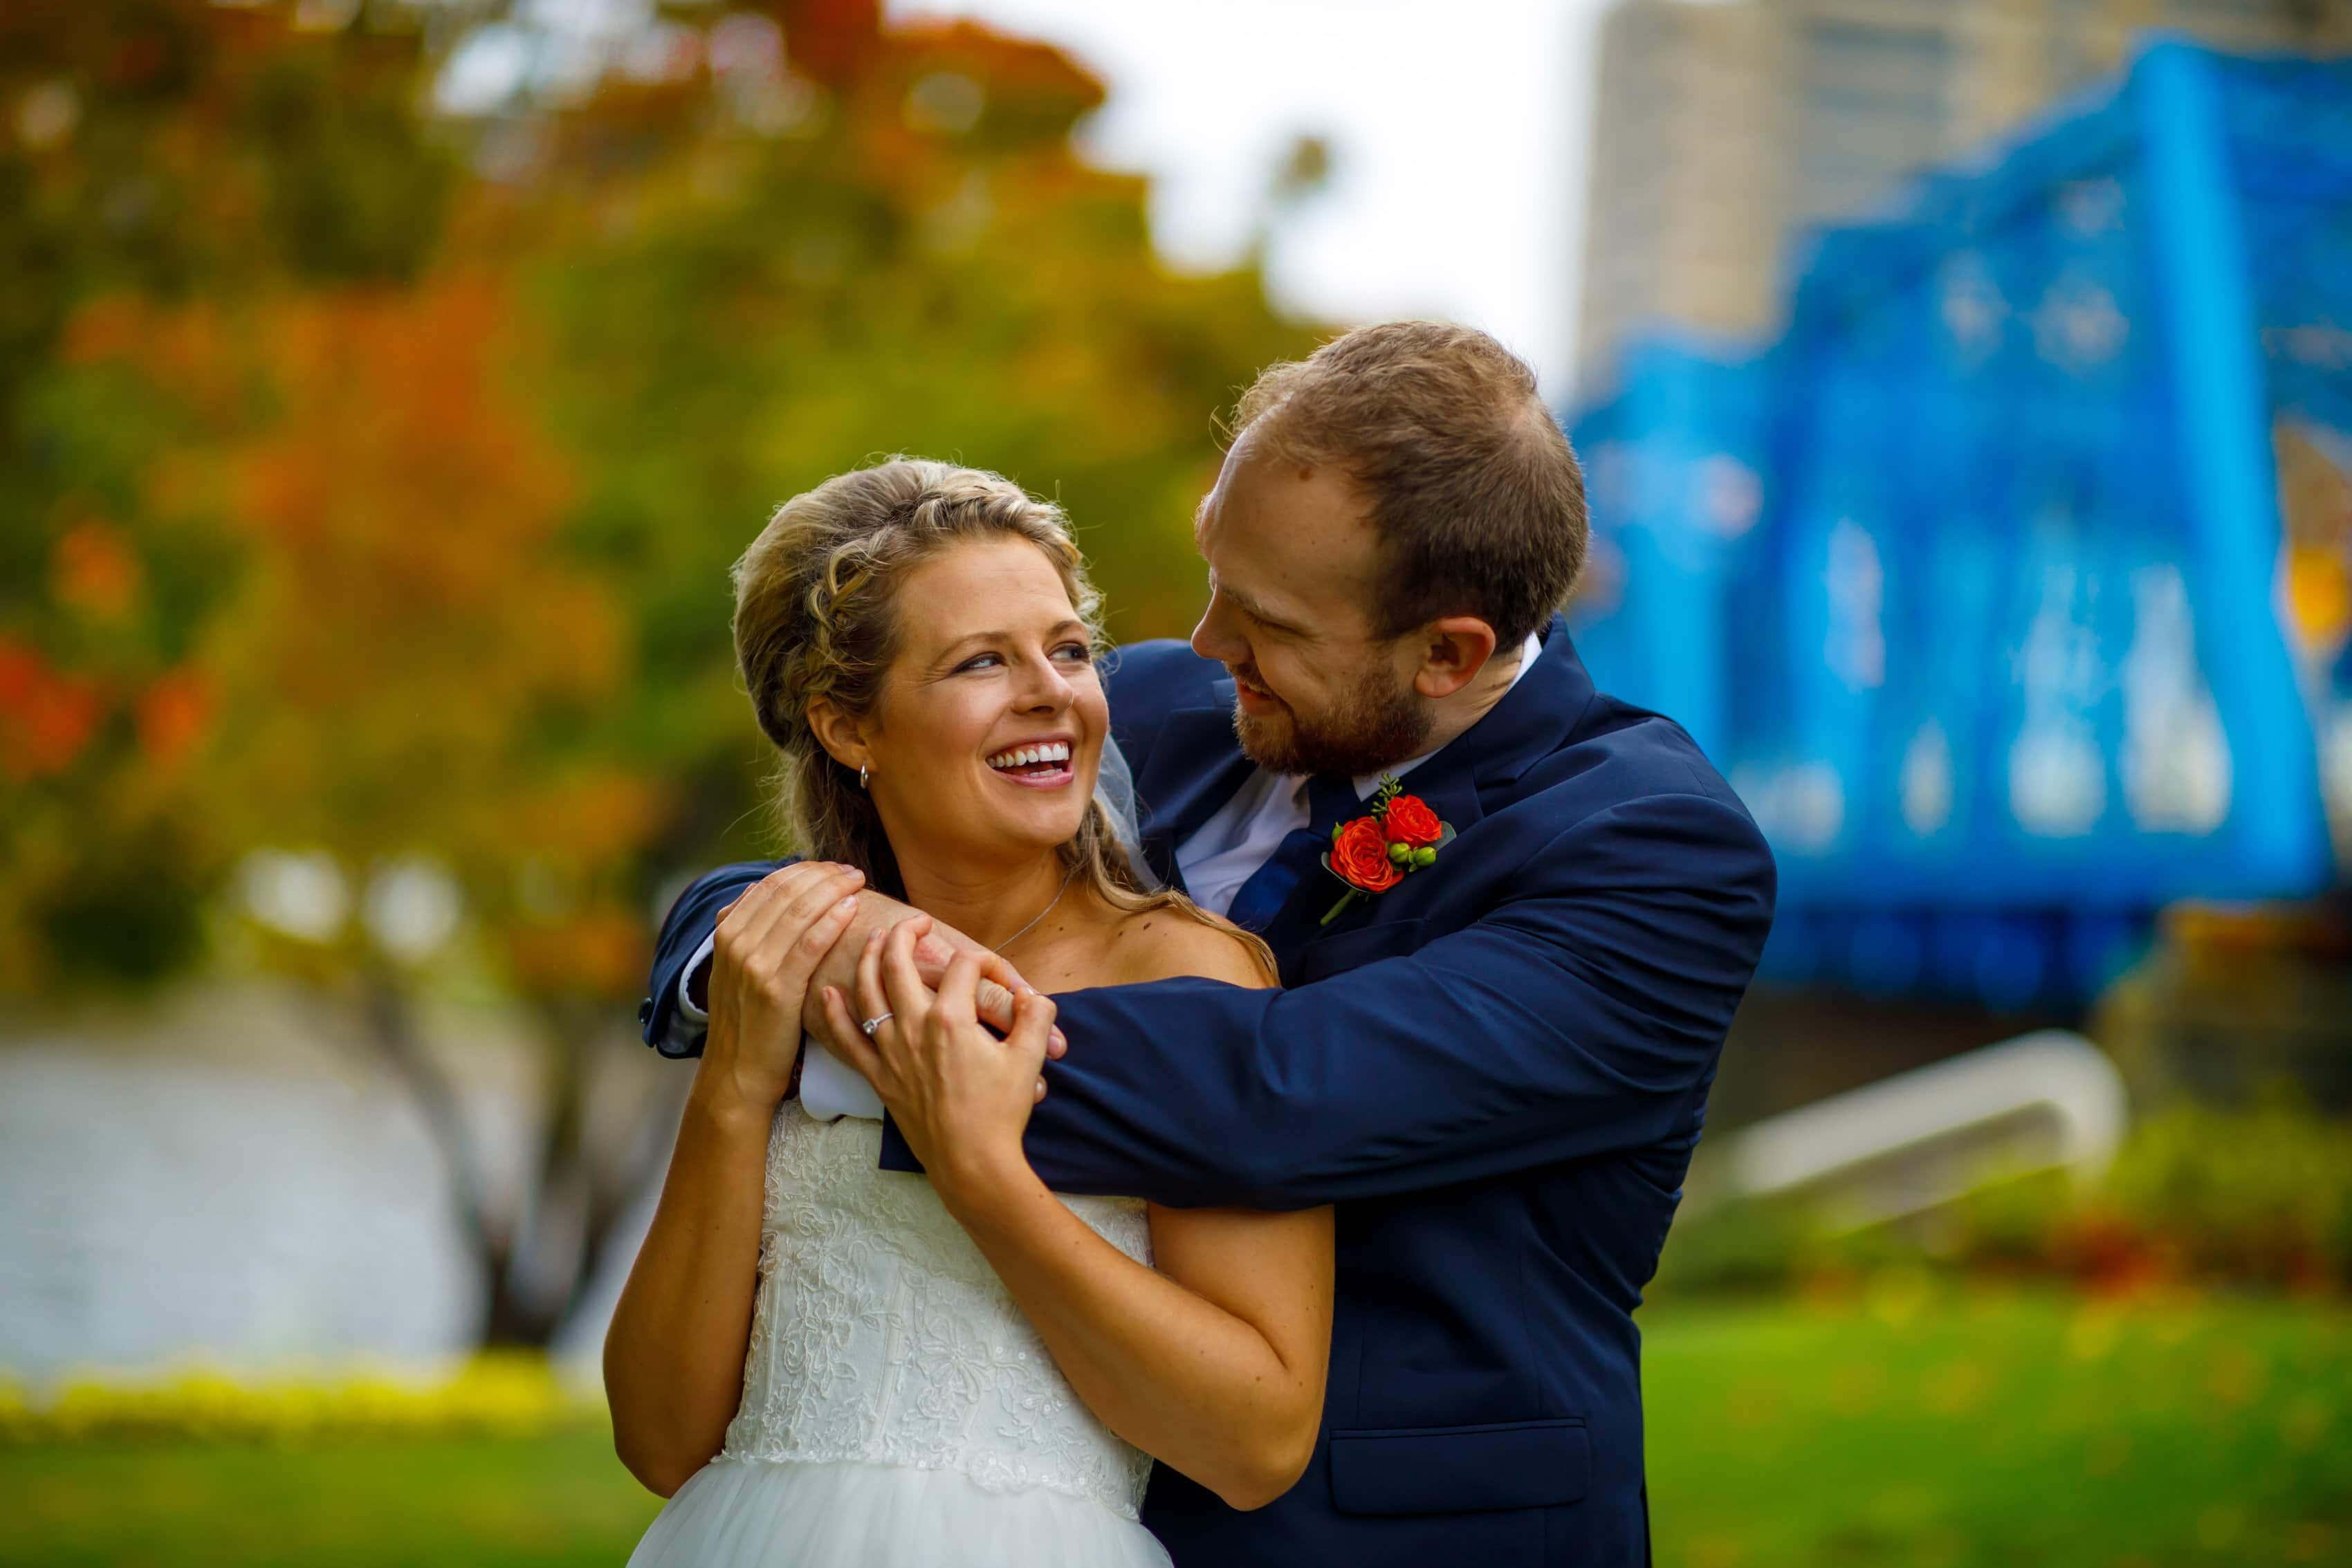 Grand Rapids Blue Bridge Wedding Photos: Christina & Cody